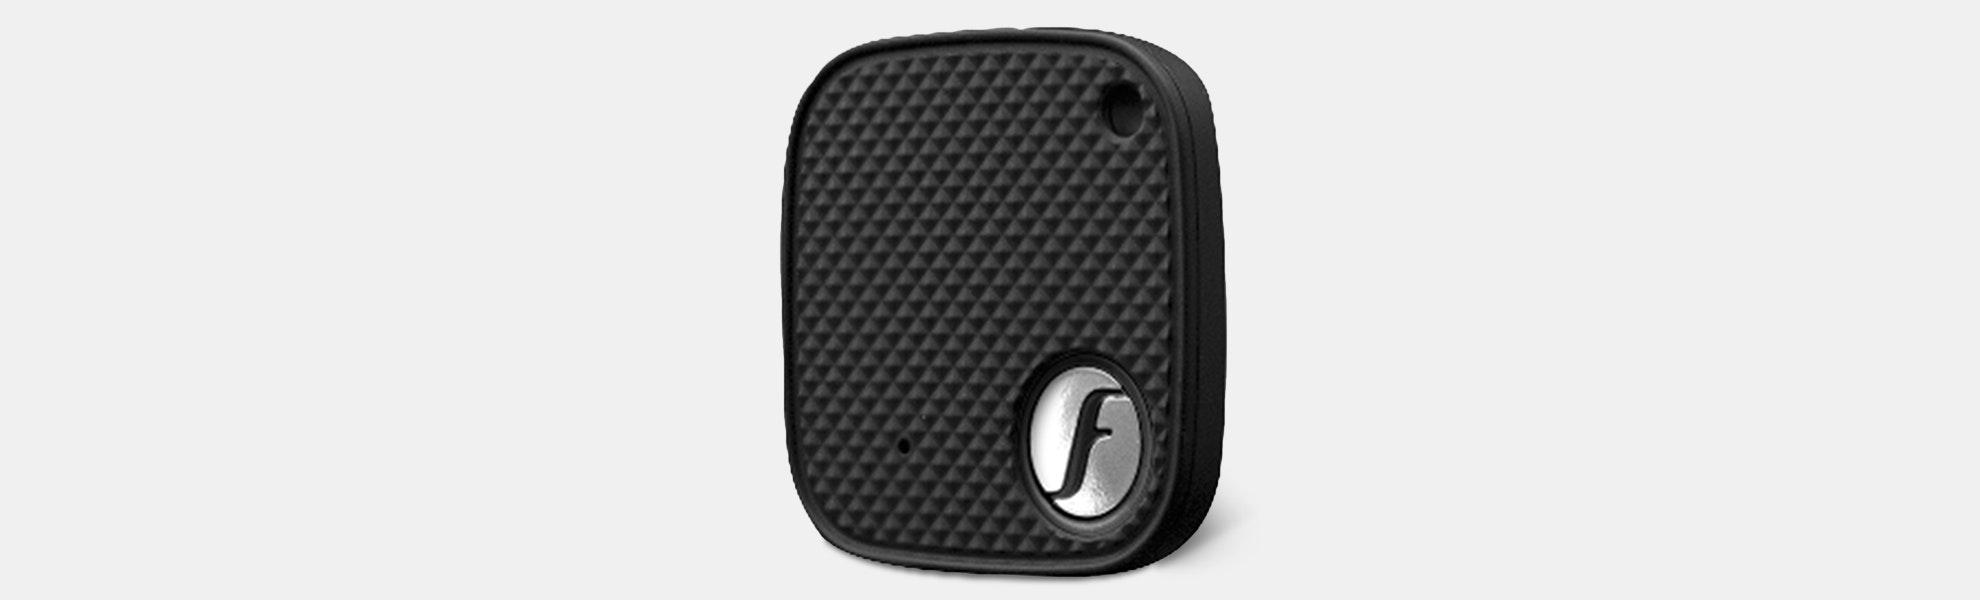 FOBO Bluetooth Tracking Tag